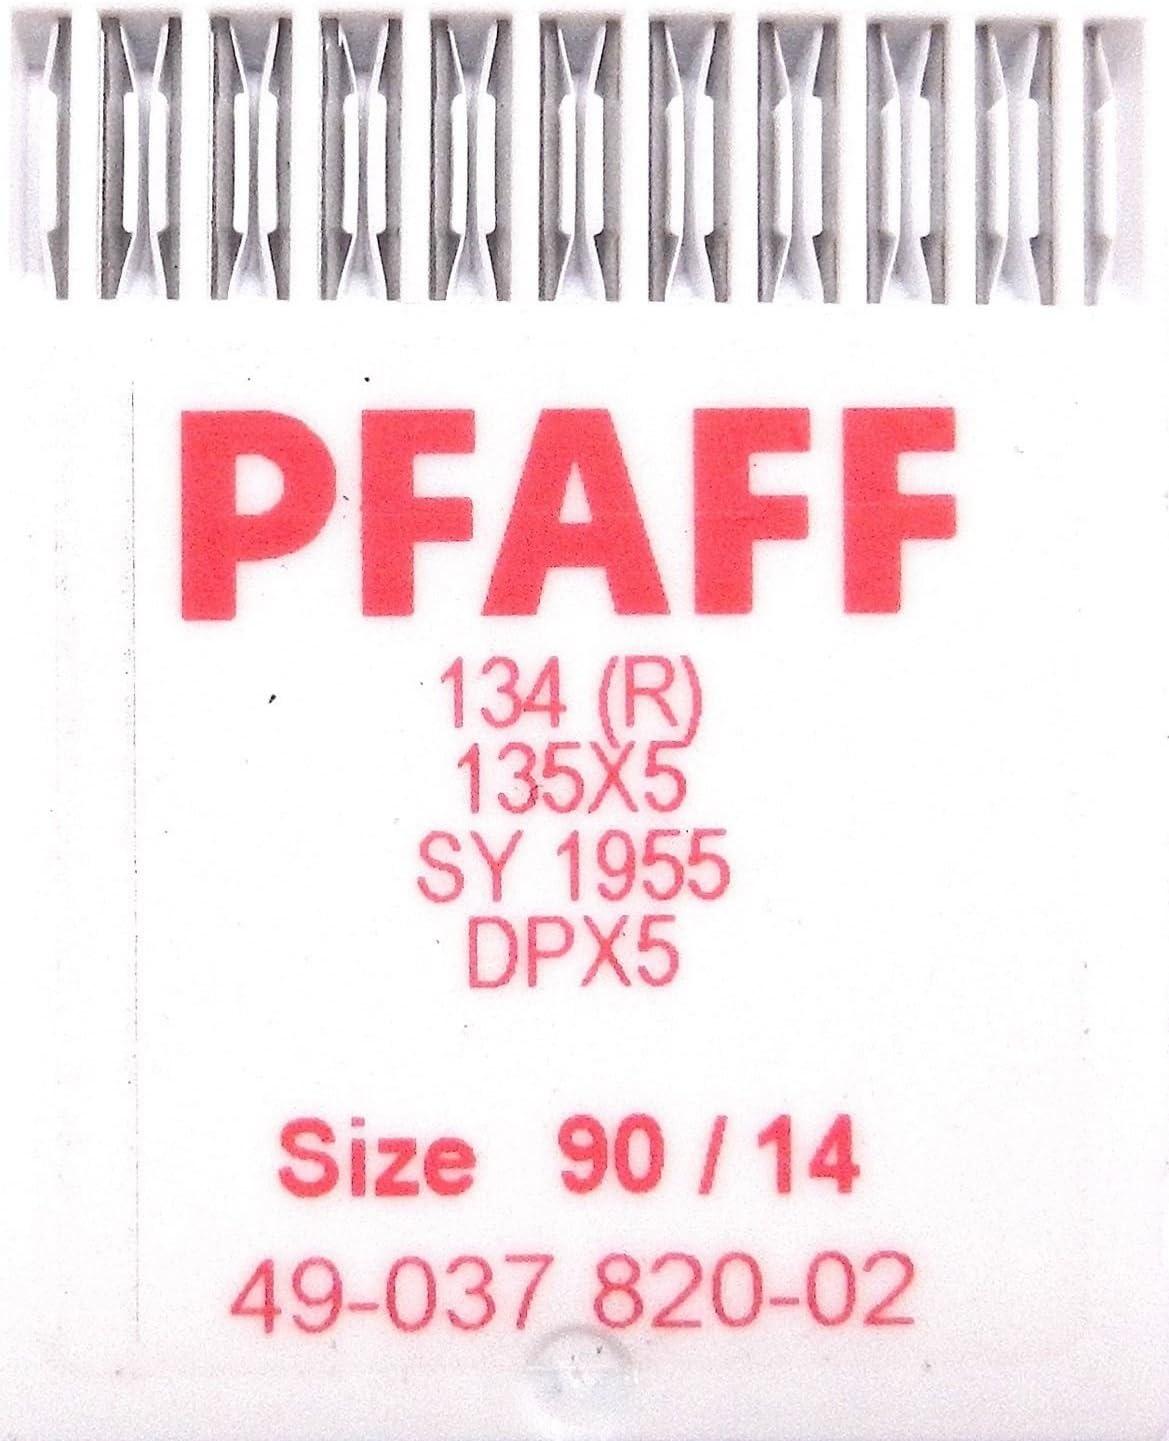 10 Agujas para máquina de coser PFAFF 134 (R). Agujas redondas ...